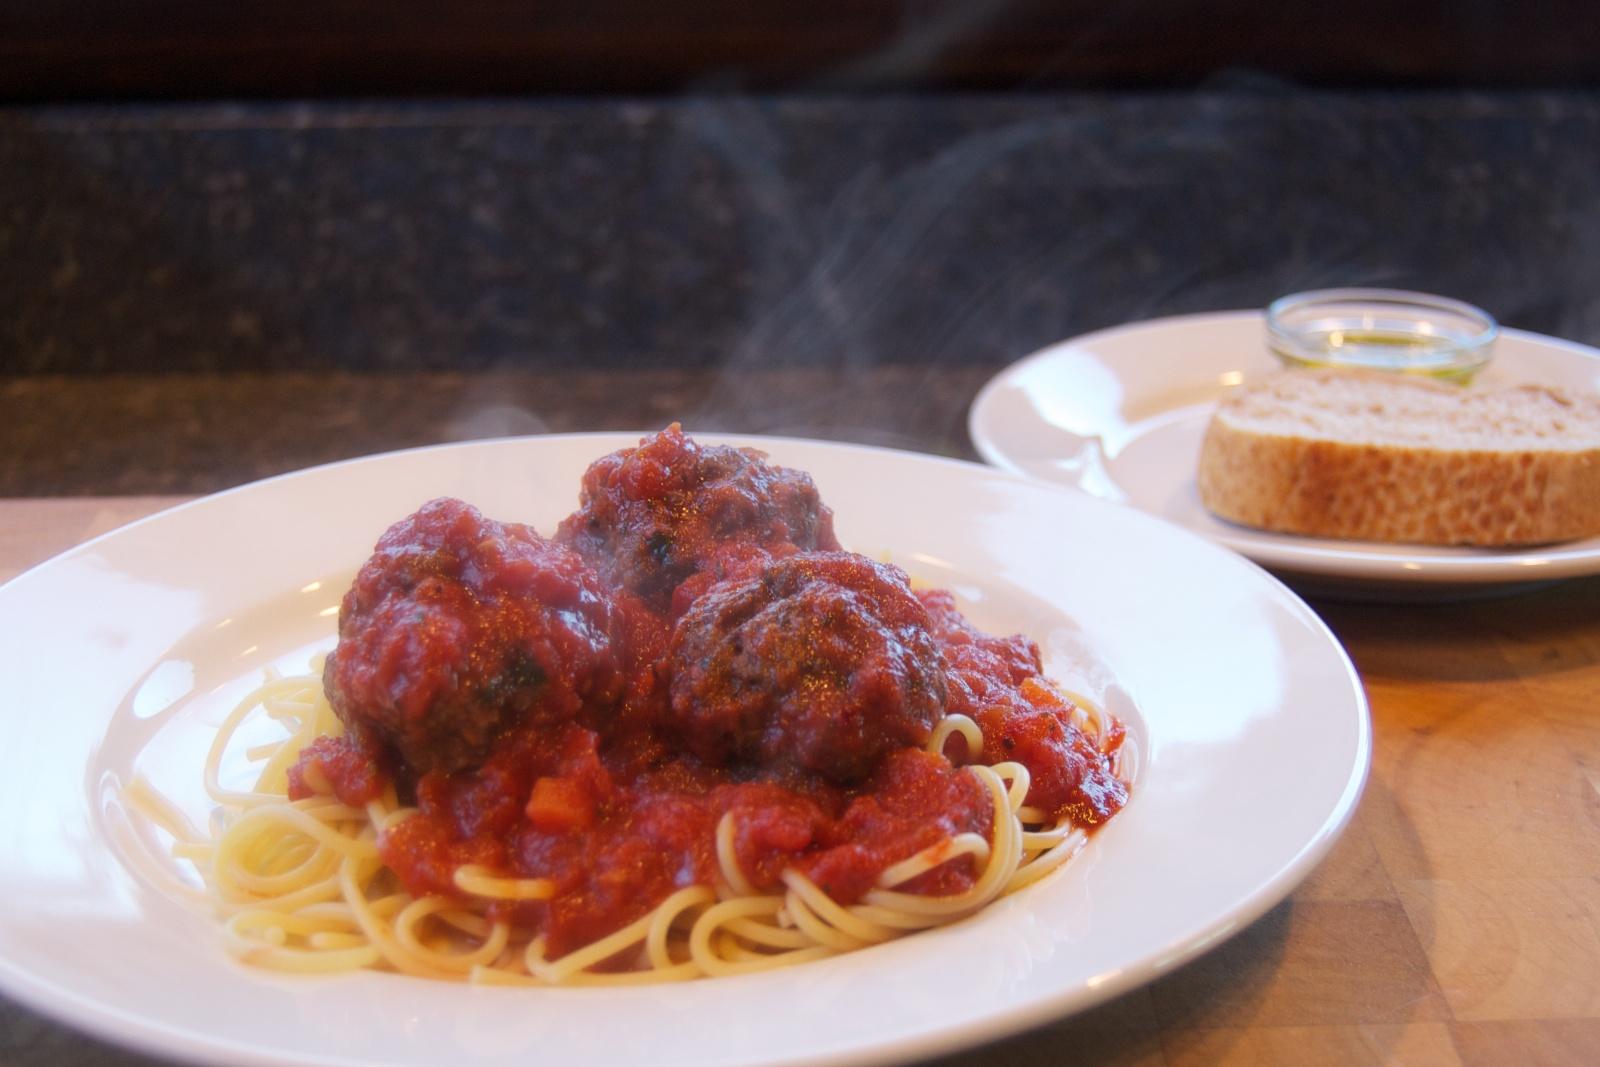 http://blog.rickk.com/food/2011/11/09/ate.2011.11.09.d.jpg